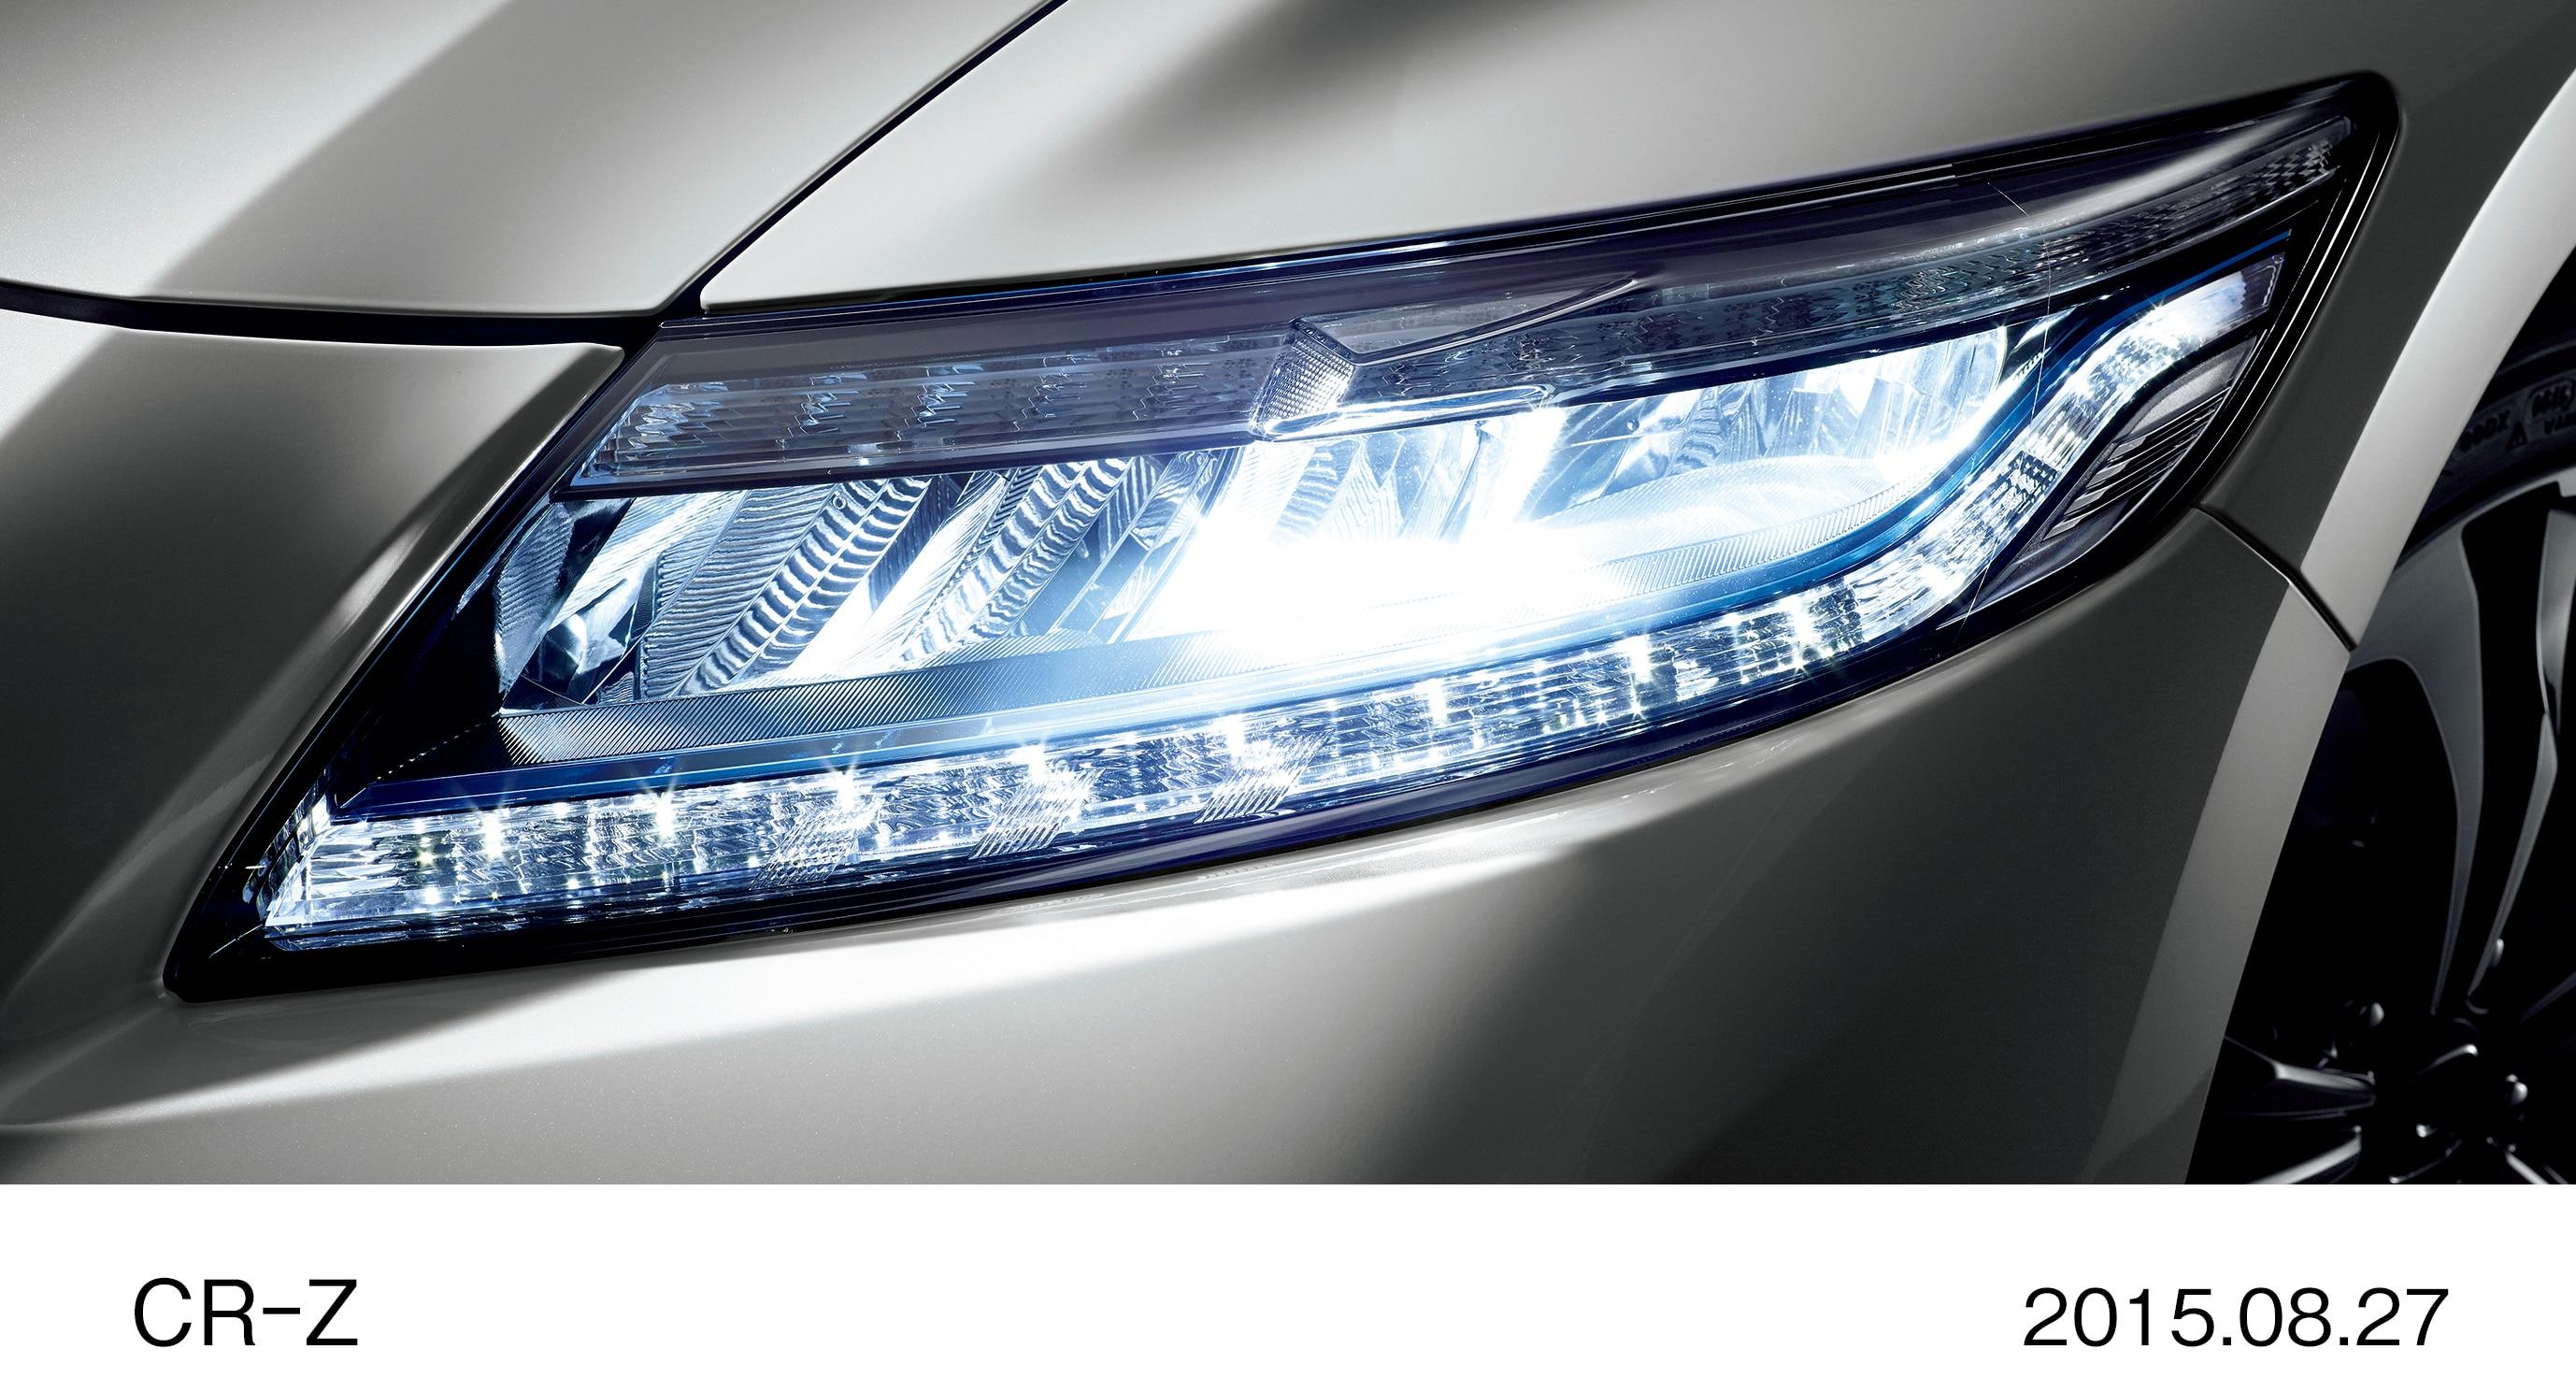 Honda CR-Z Hybrid Refreshed for Japan